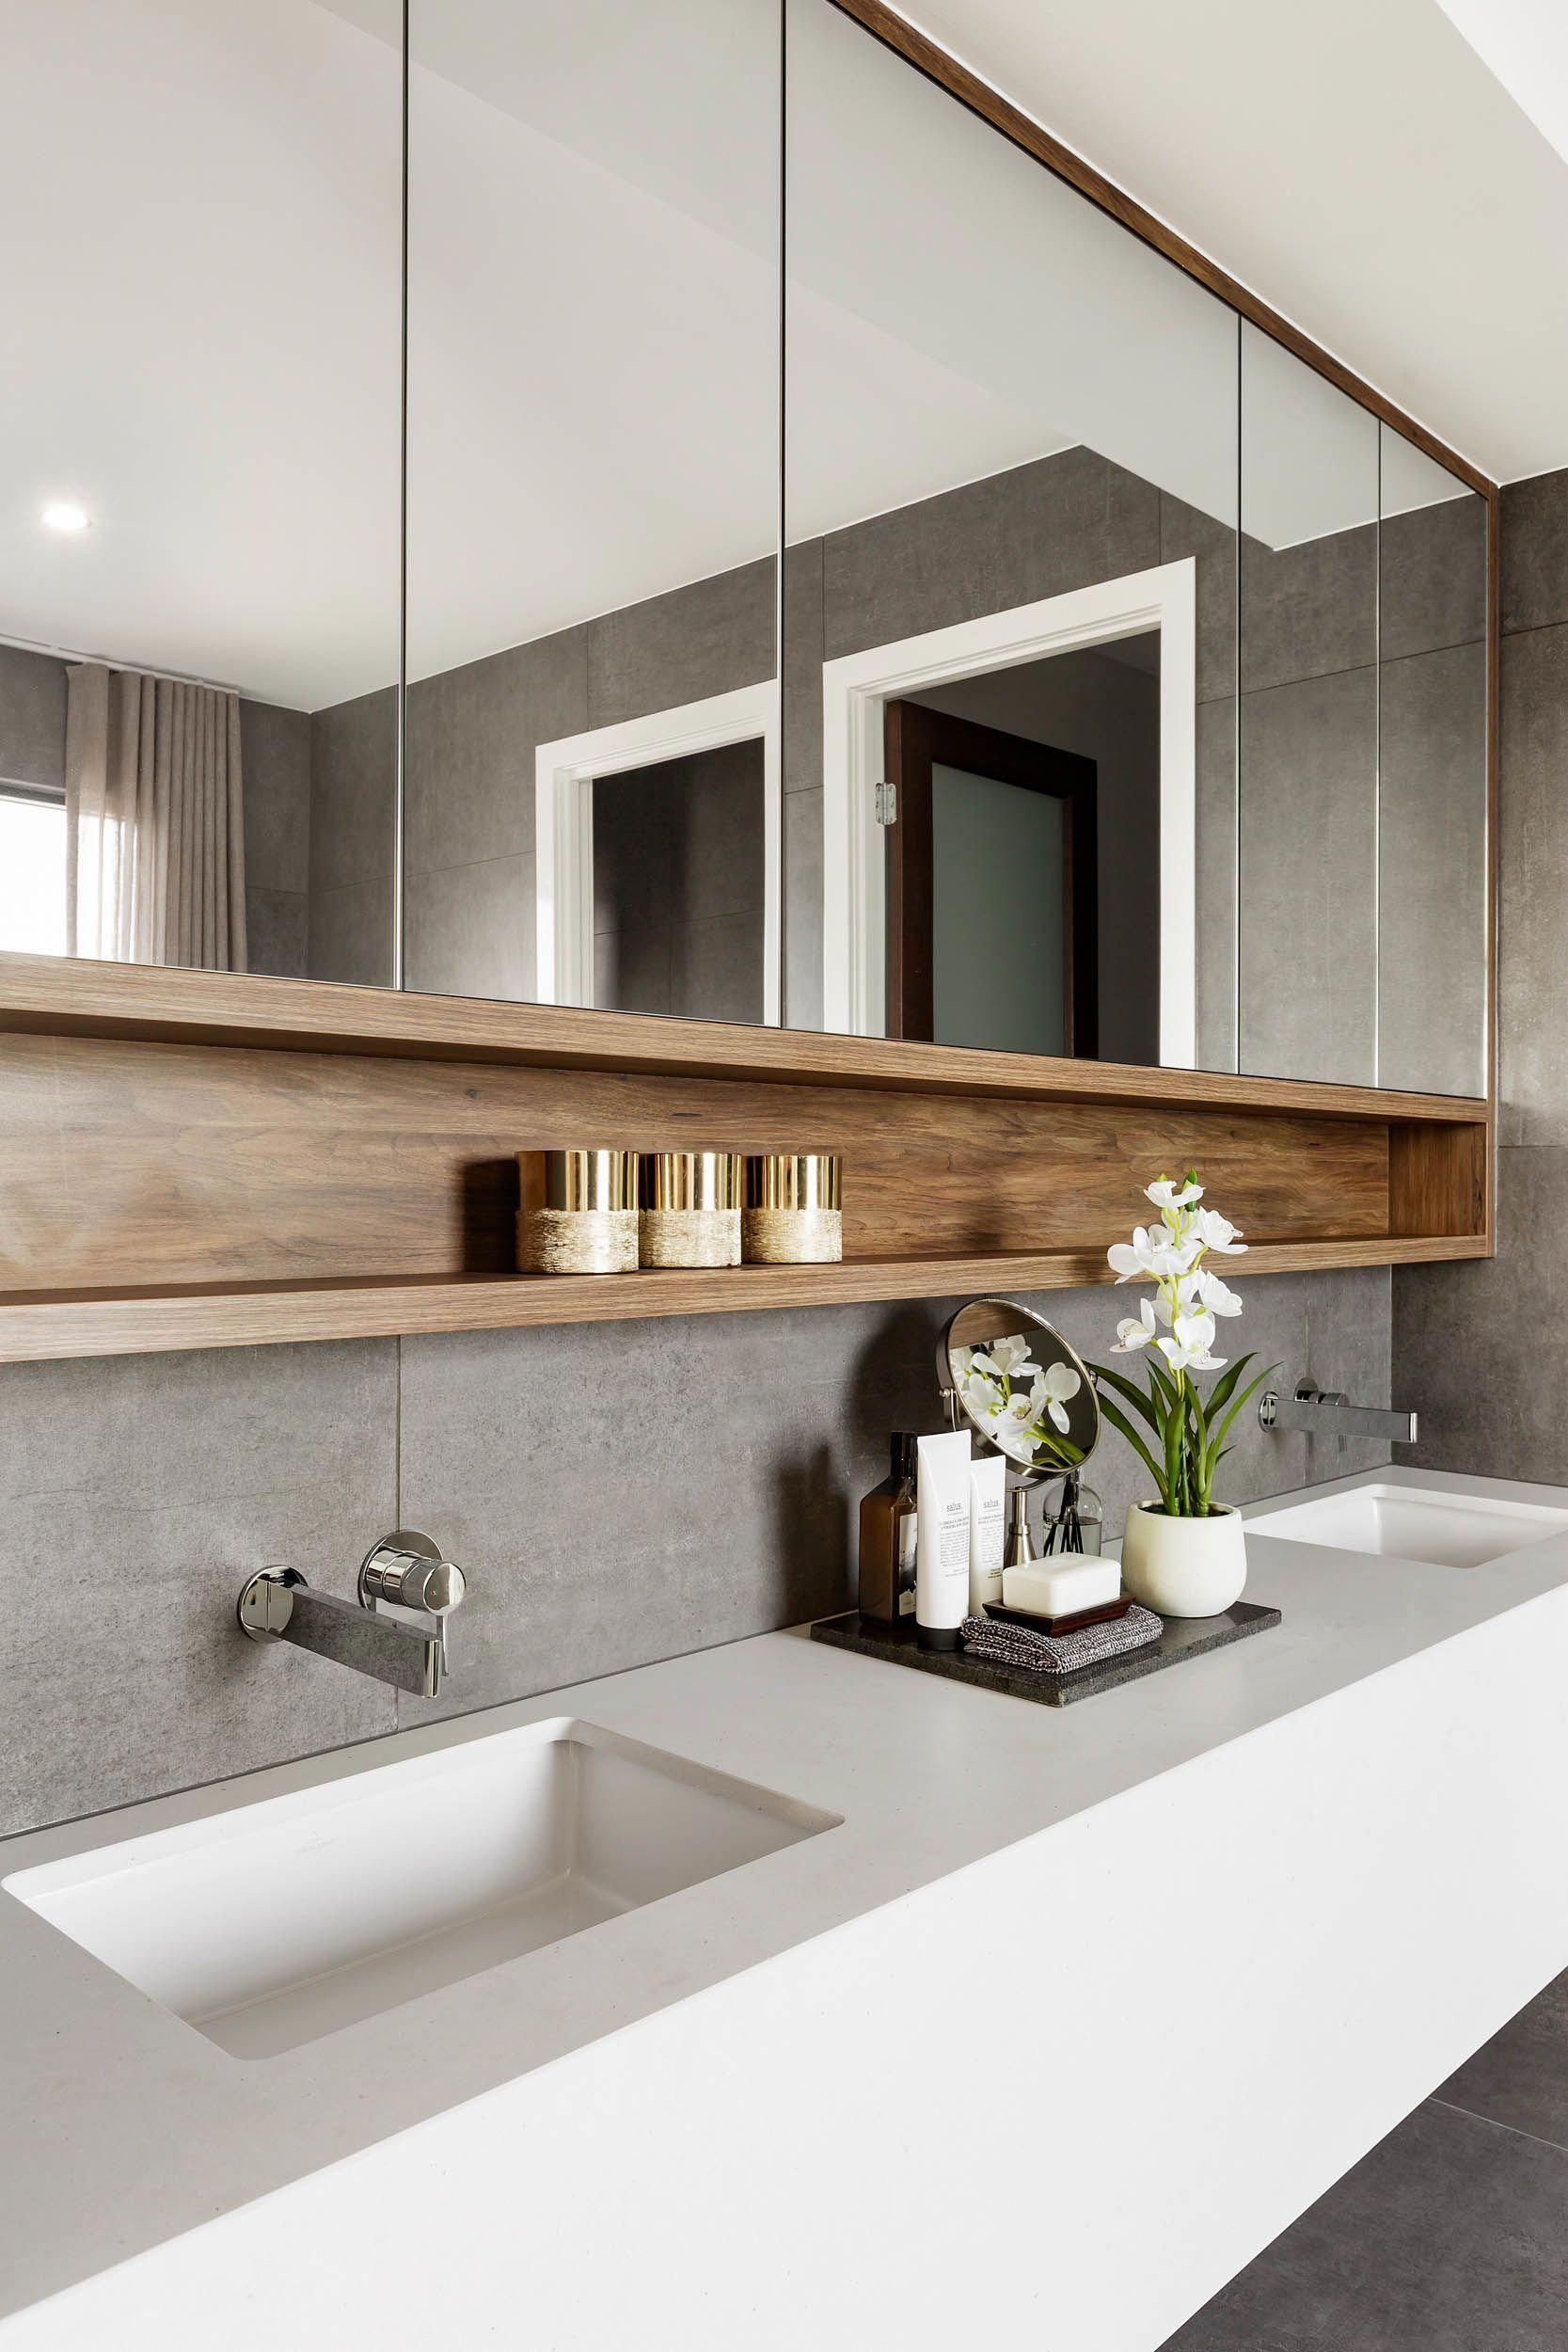 Surprising Bathroom Vanities Columbus Ohio Small Bathroom Storage In Home Interior And Landscaping Ologienasavecom